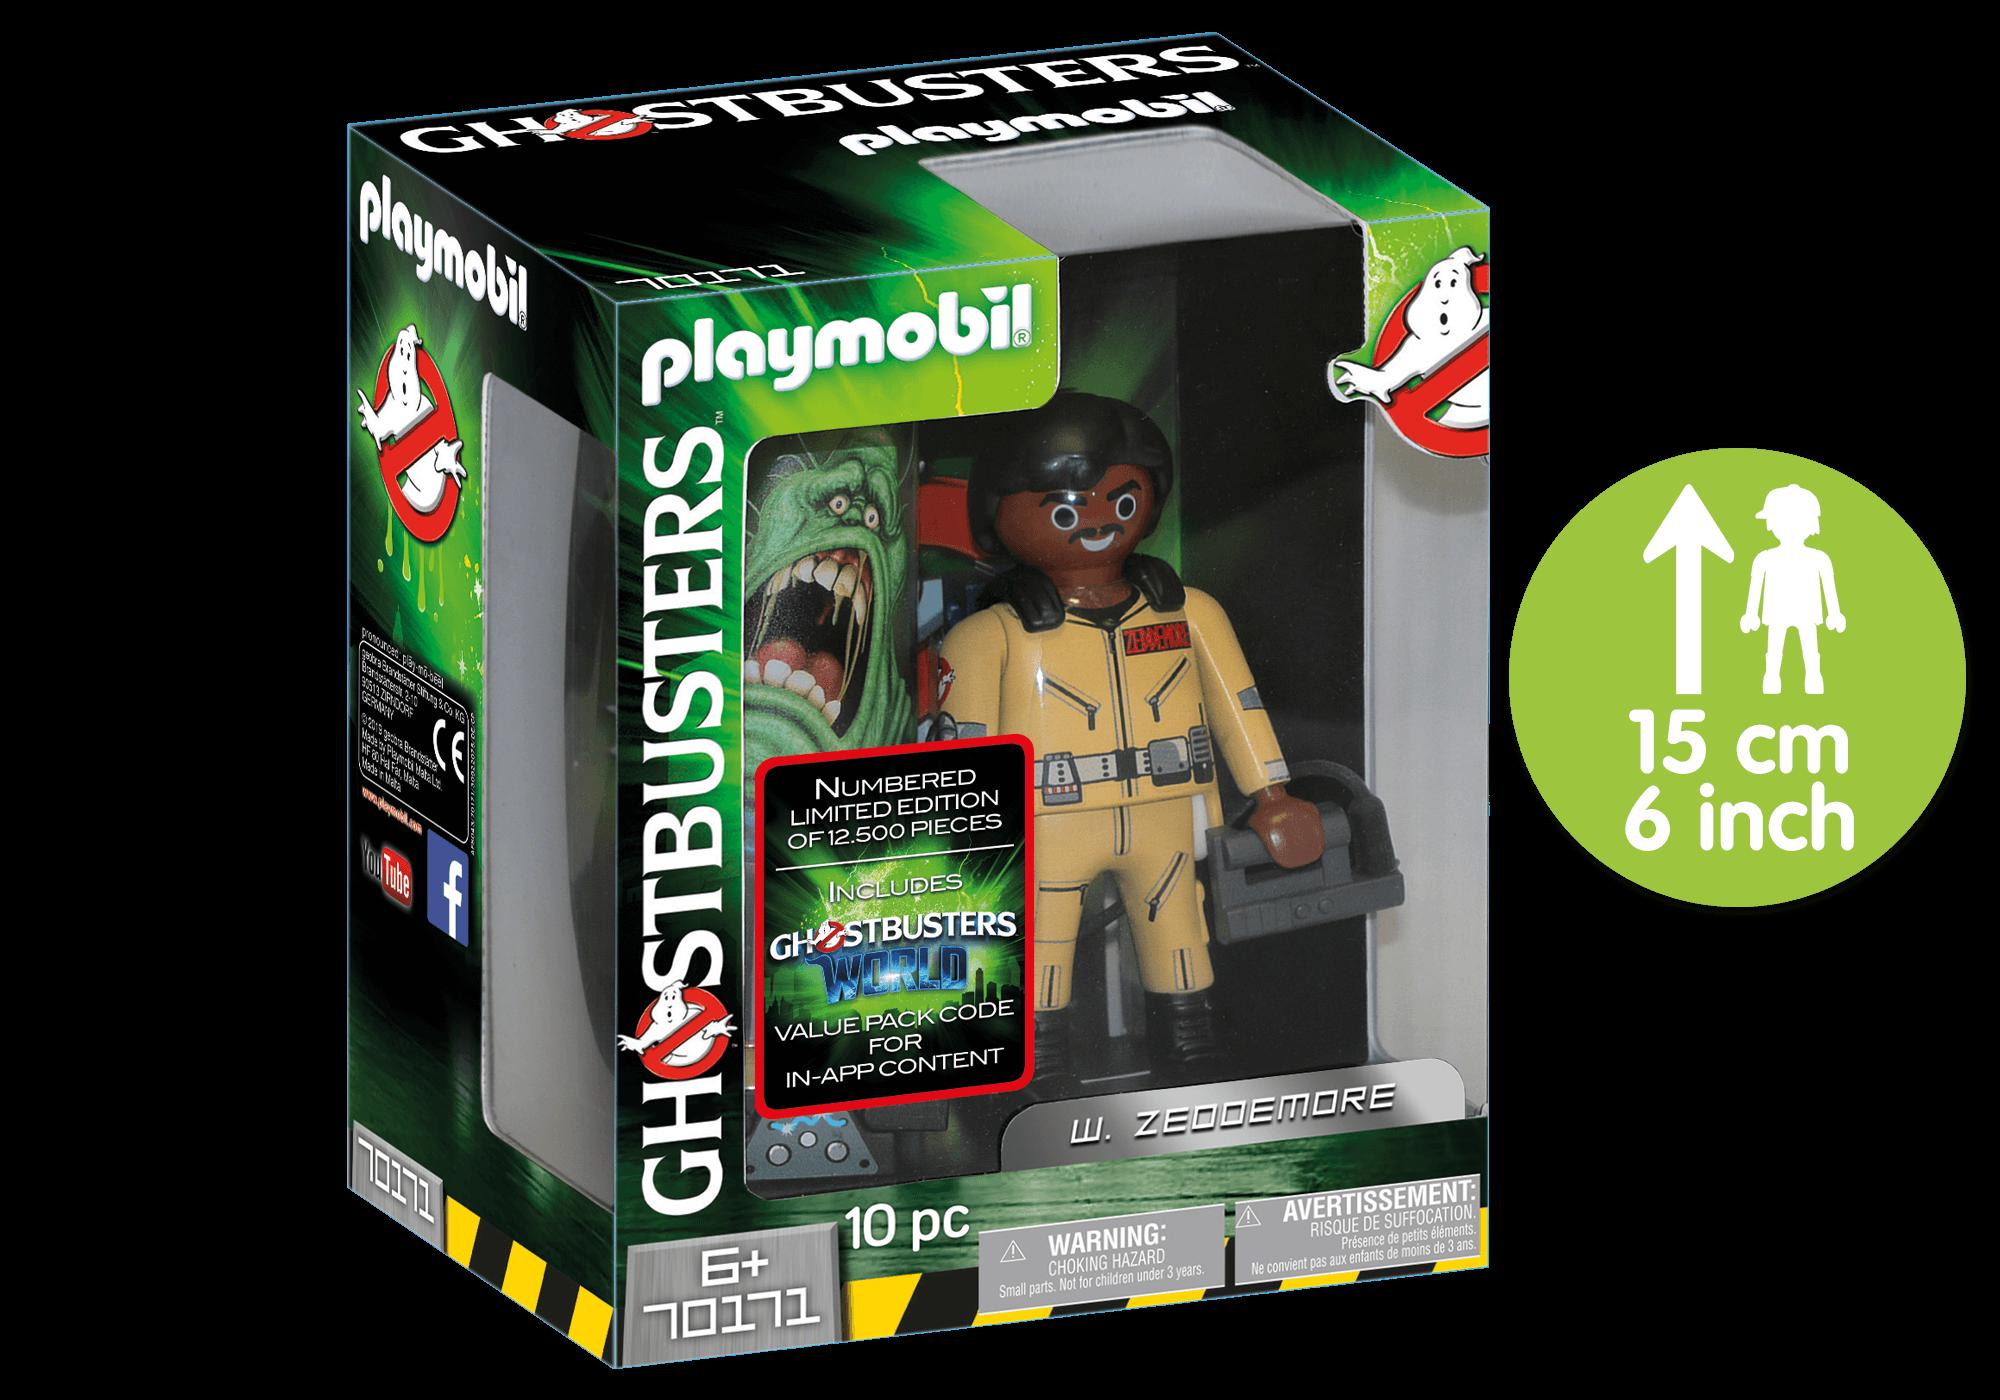 http://media.playmobil.com/i/playmobil/70171_product_detail/Ghostbusters™ Samlarutgåva W. Zeddemore